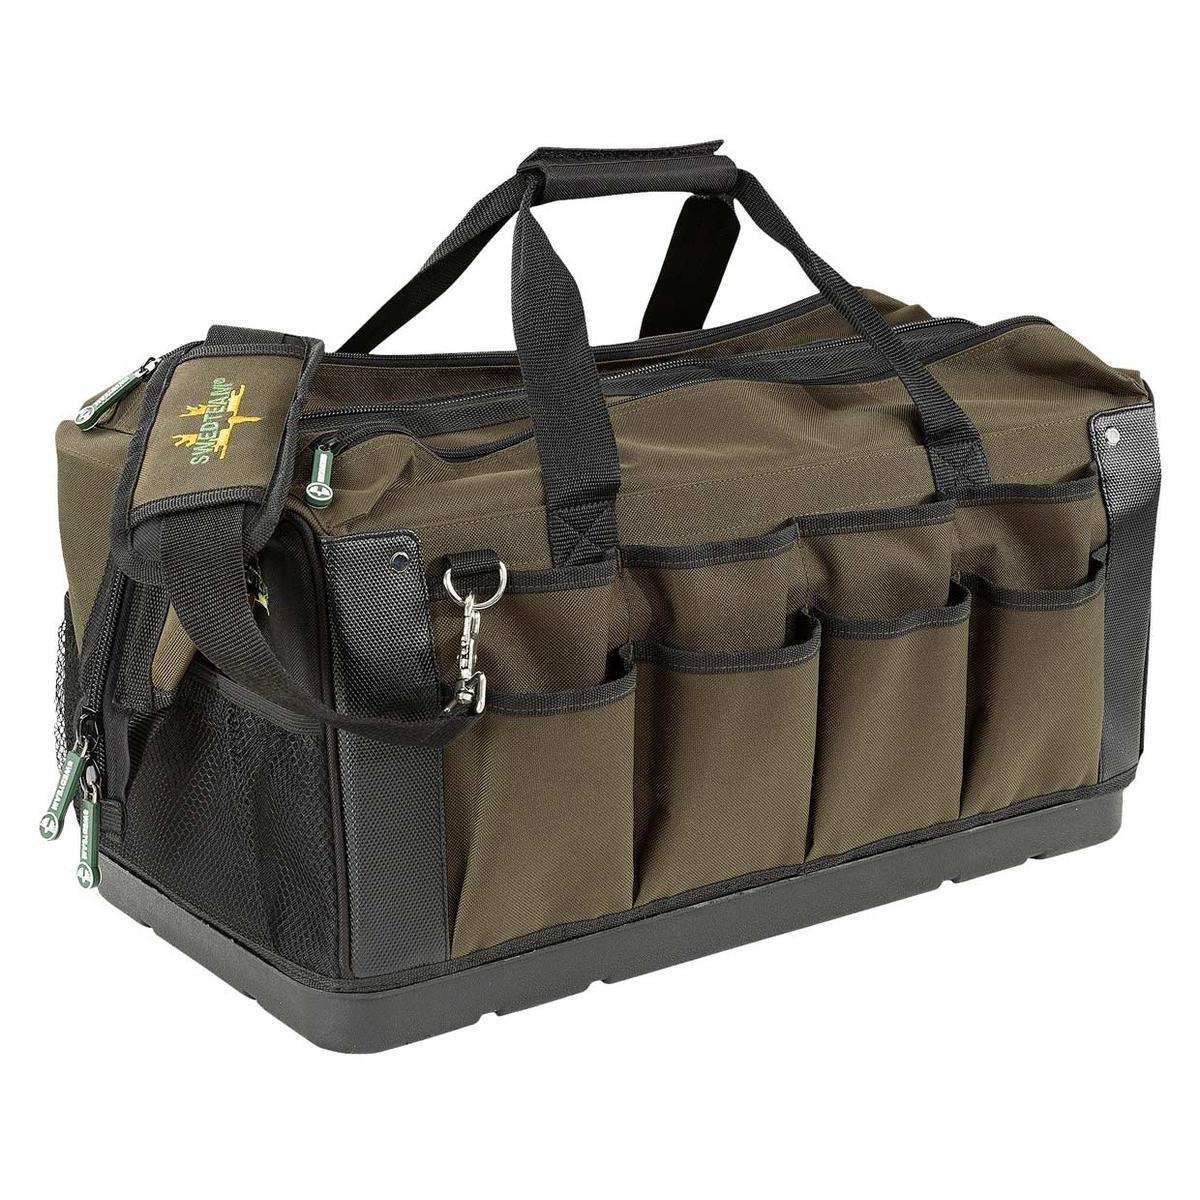 SwedTeam Hunting Storage Bag by SwedTeam (Image #1)